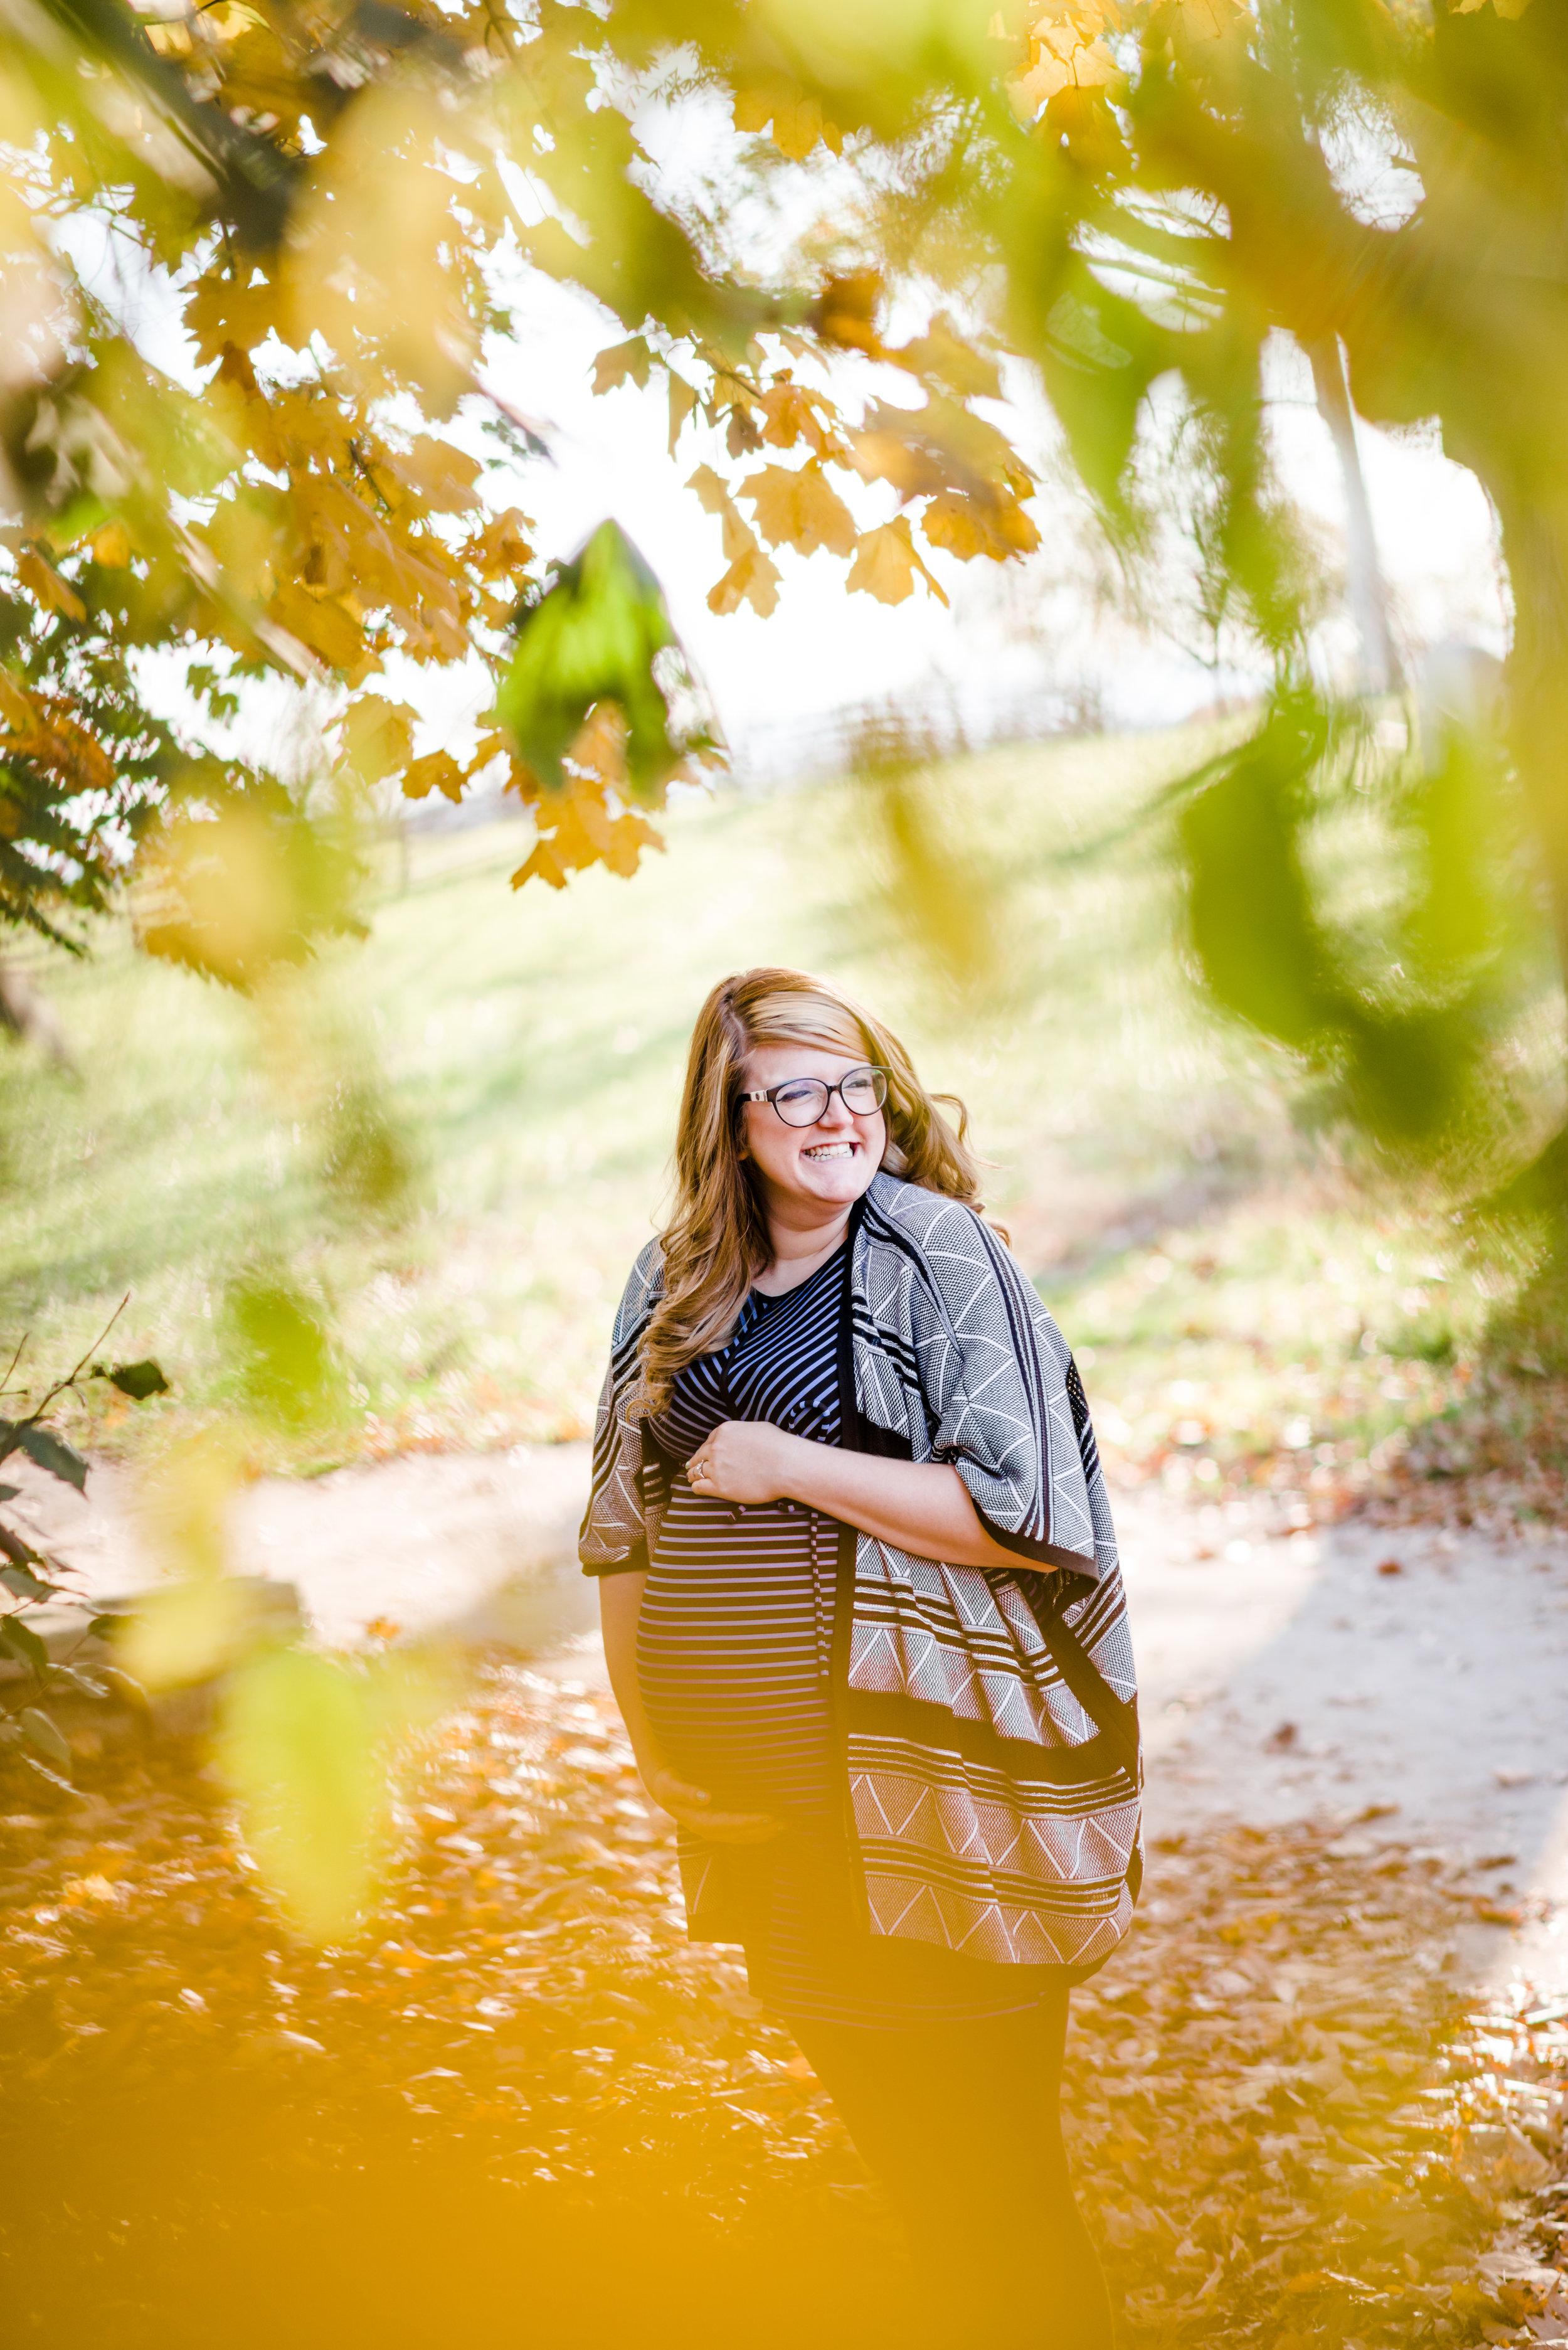 Kirsten-Smith-Photography-Kaskel-Family-26.jpg